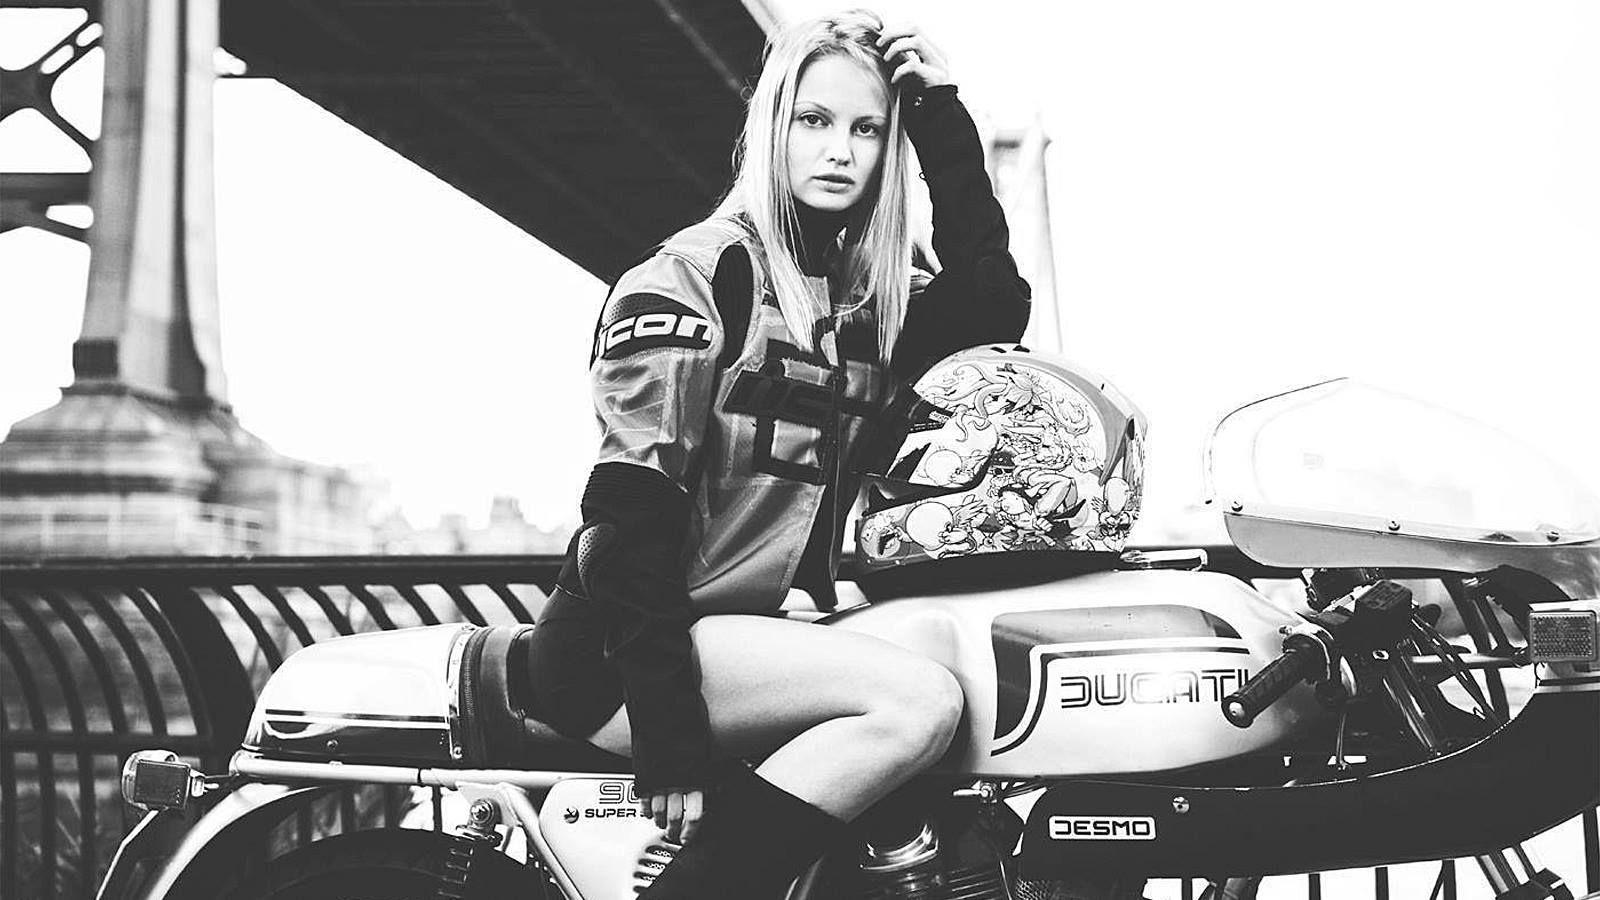 Blonde #girl on a #vintage #Ducati